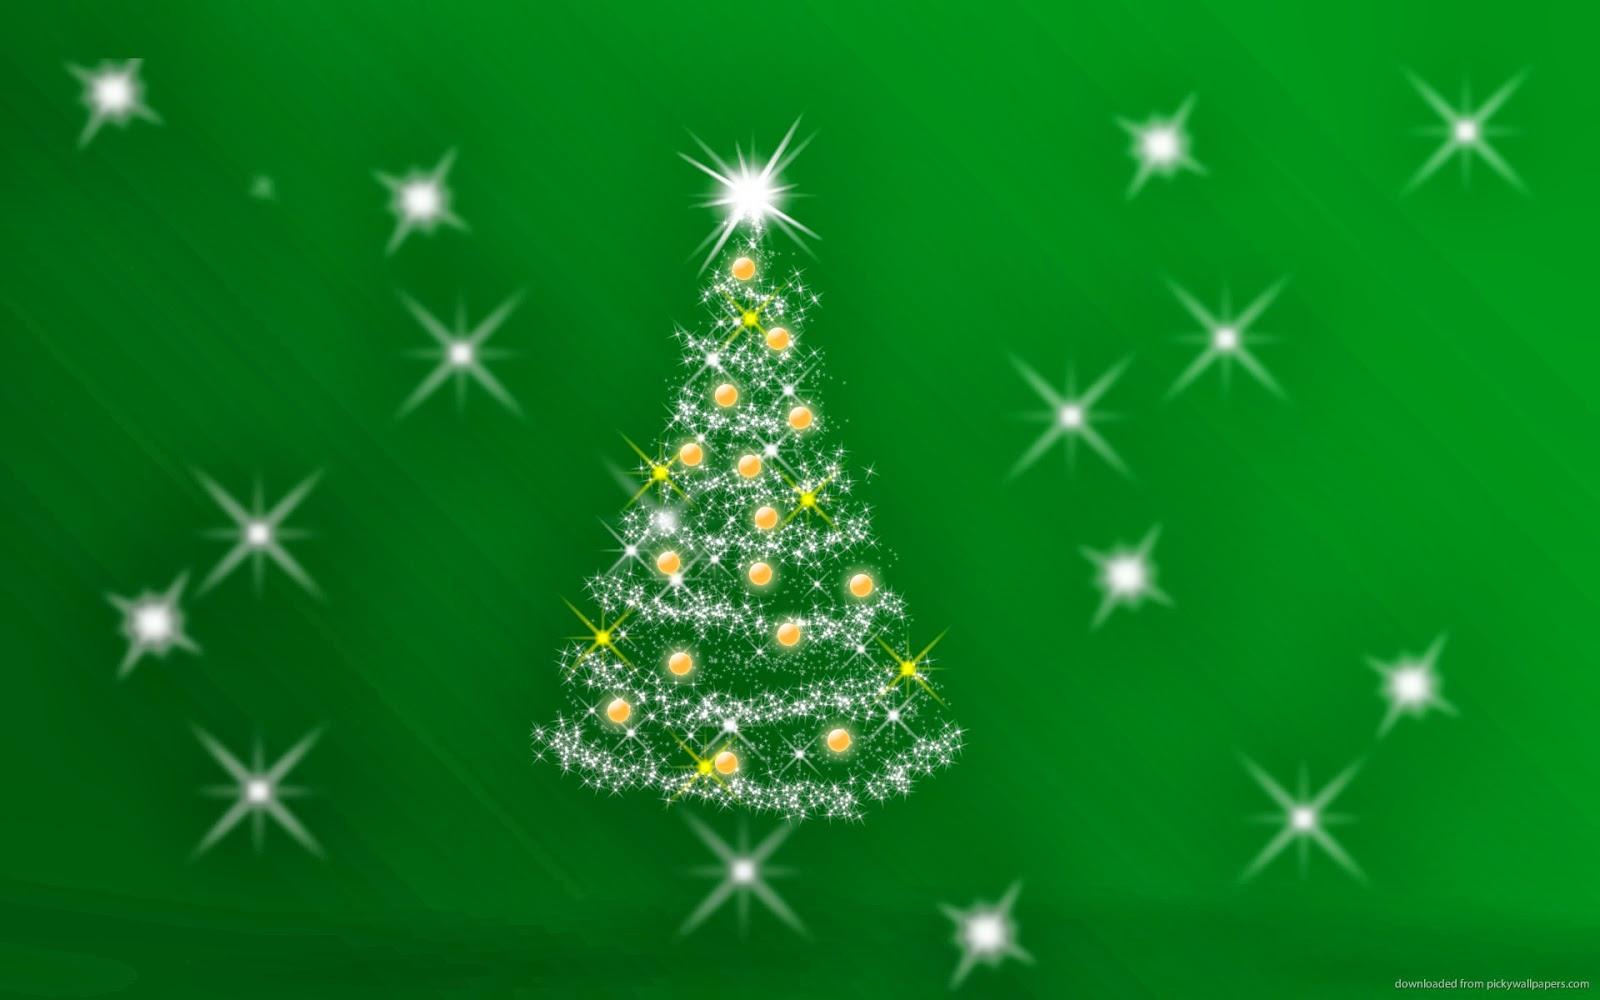 Green Christmas Background HD Wallpaper - HD Wallpapers Blog